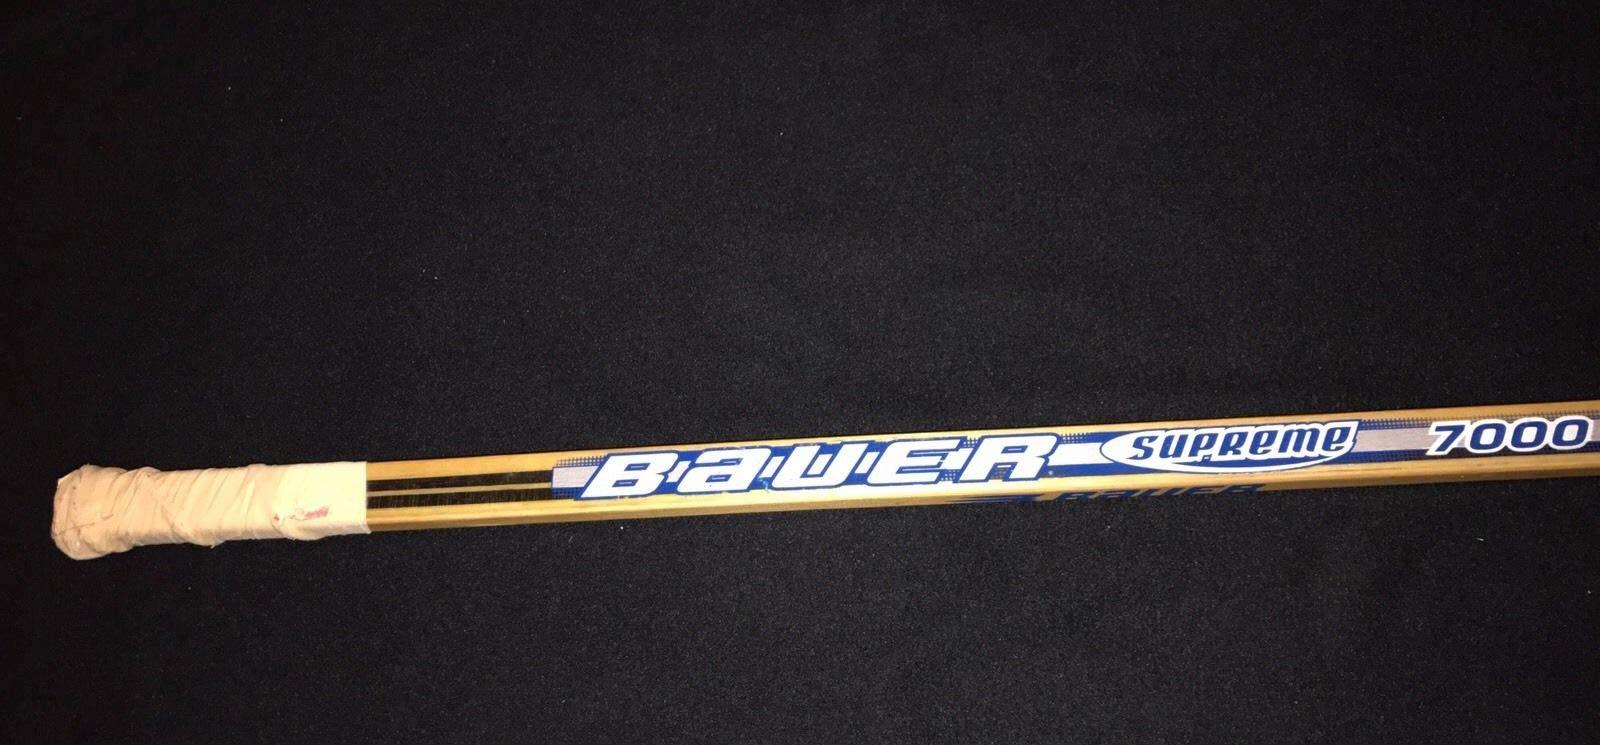 Bob Probert Autographed Signed Chicago Blackhawks Game Used Bauer Supreme Stick JSA Authentic Loa